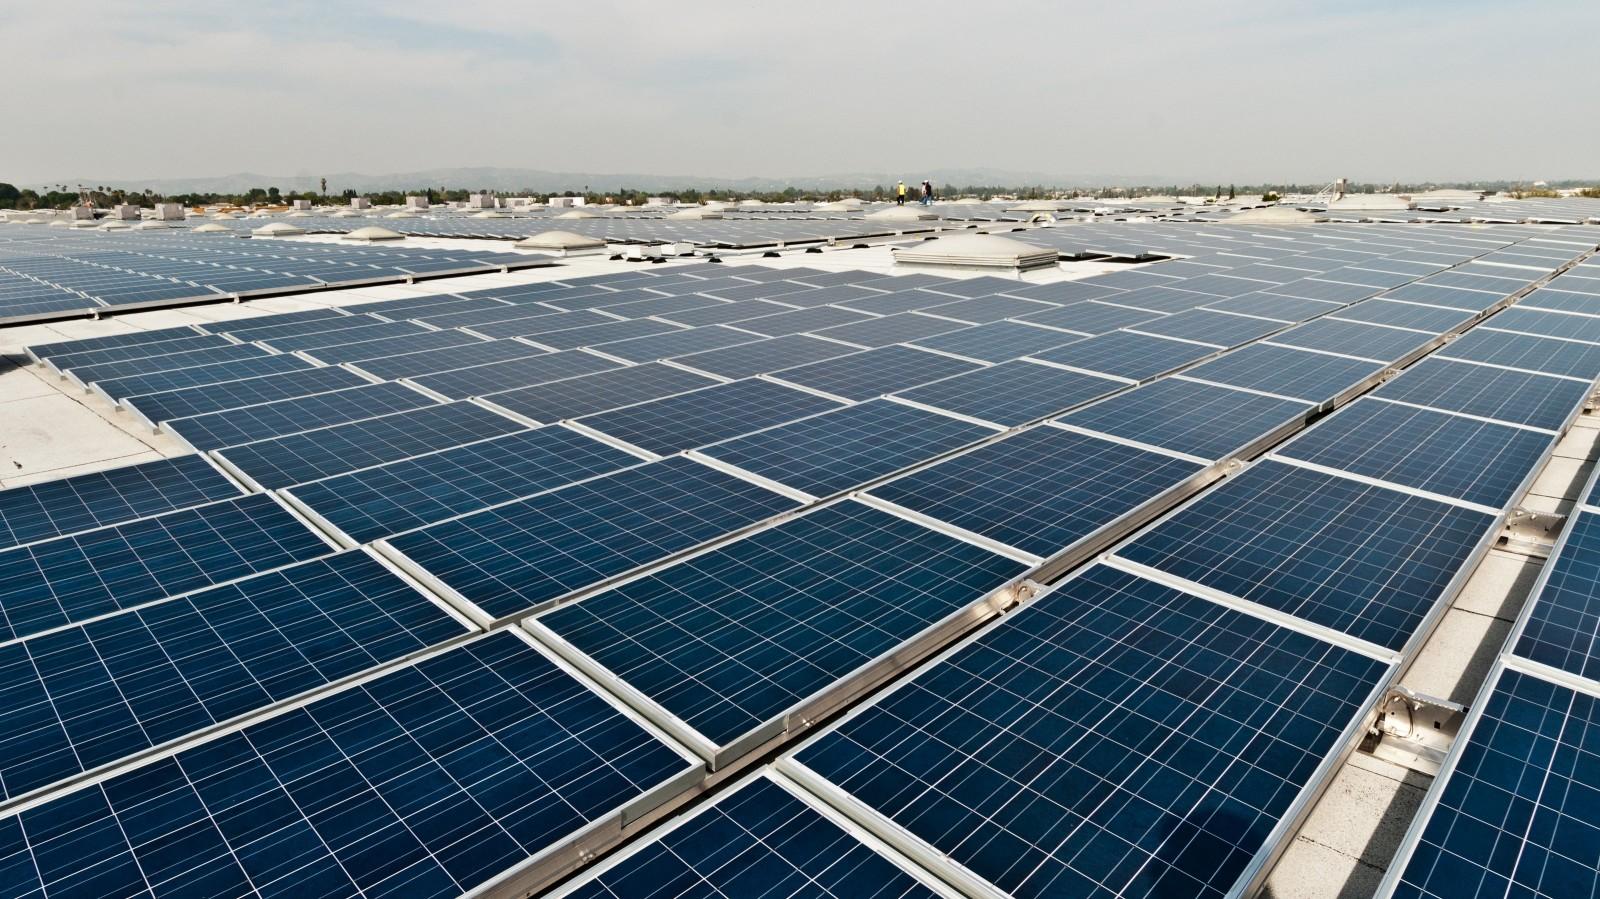 Yingli Green To Supply Borrego Solar With 40 Megawatts Of